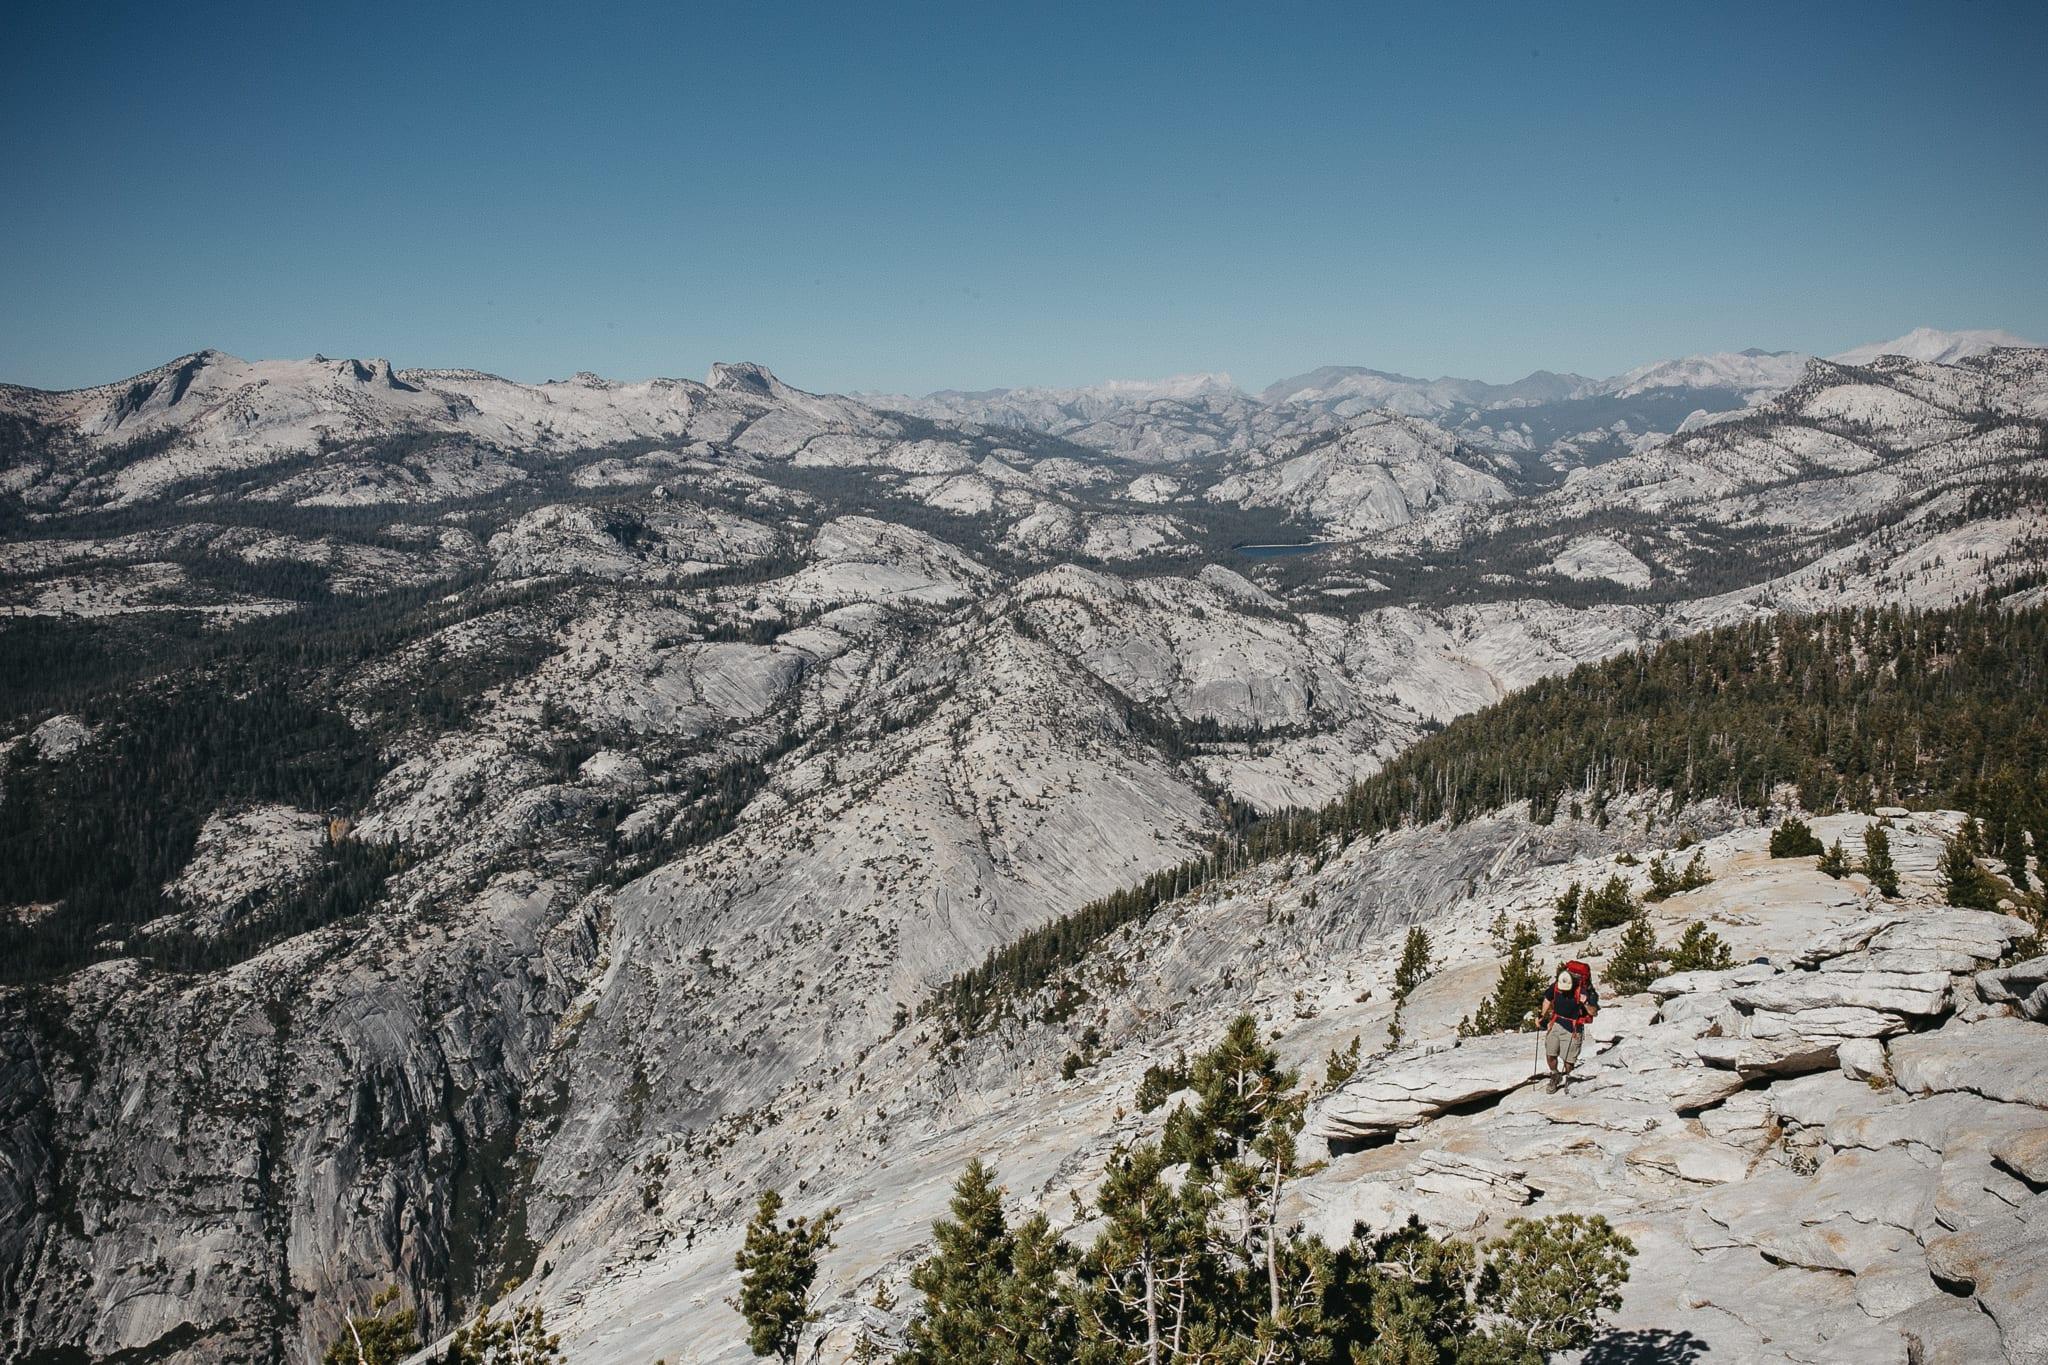 clouds-rest-yosemite-california-engagement-lifestyle-adventure-photographer-7